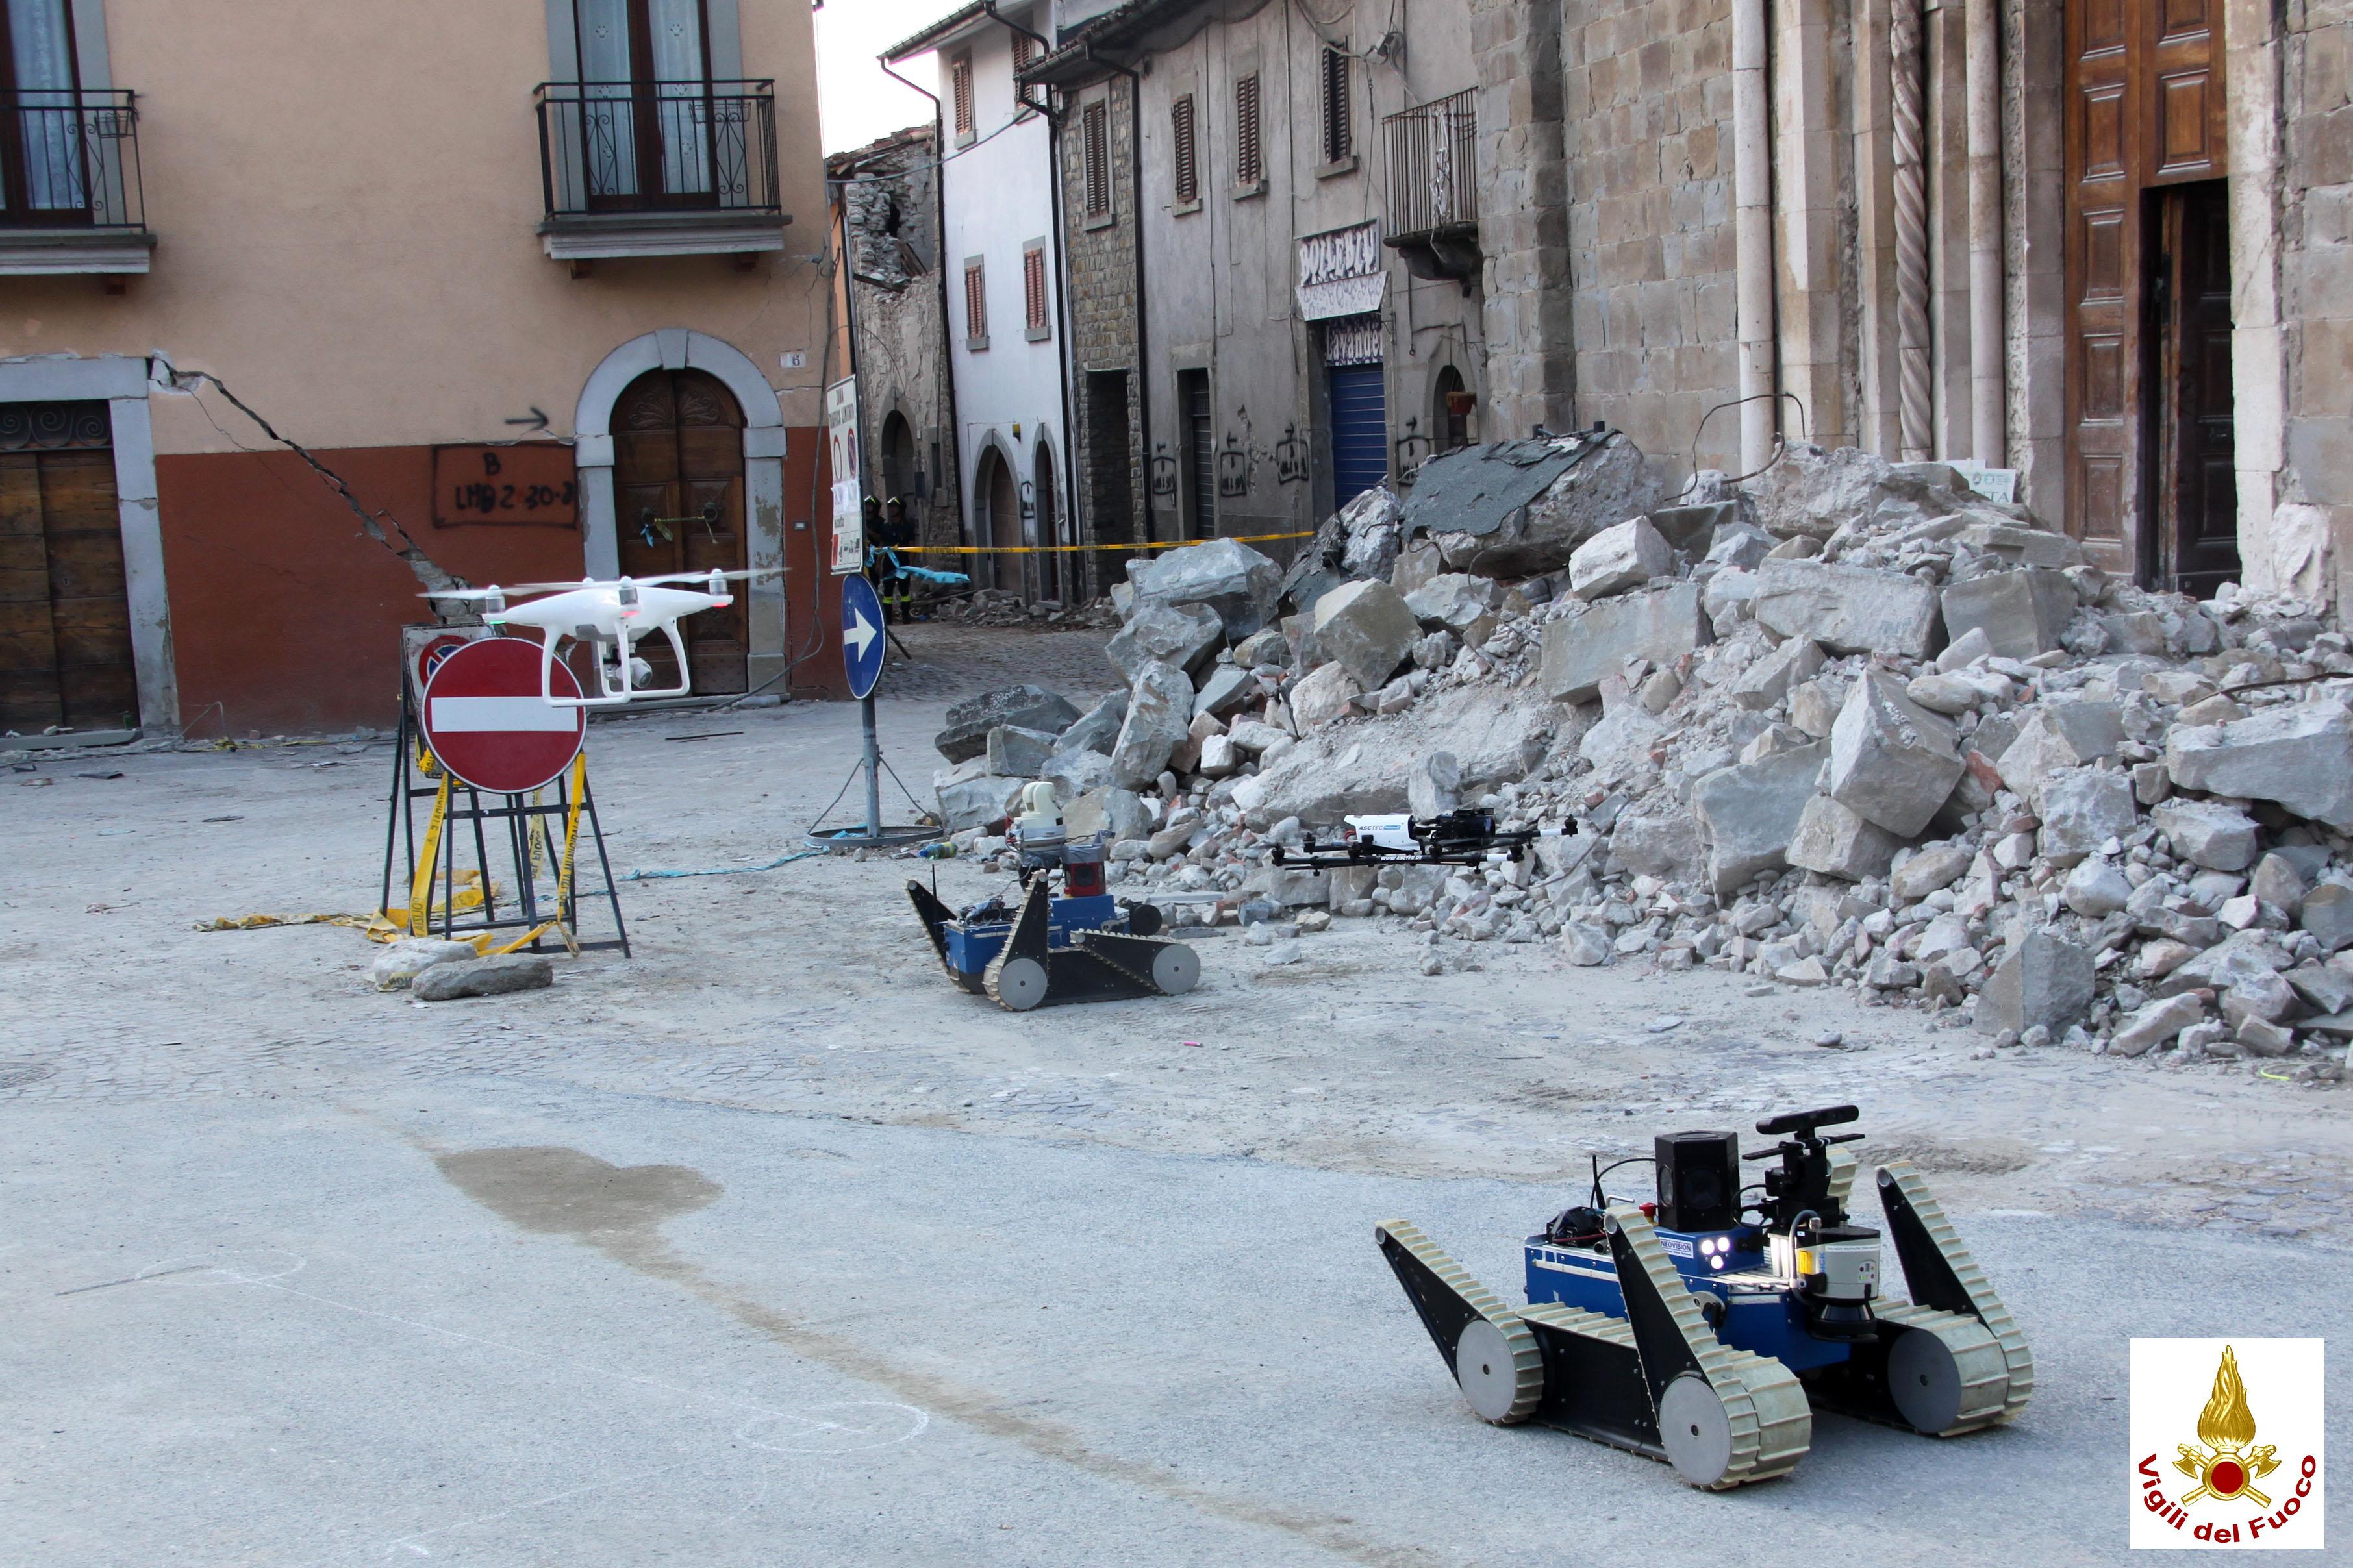 TRADRandVigiliDelFuocoAmatriceRobots